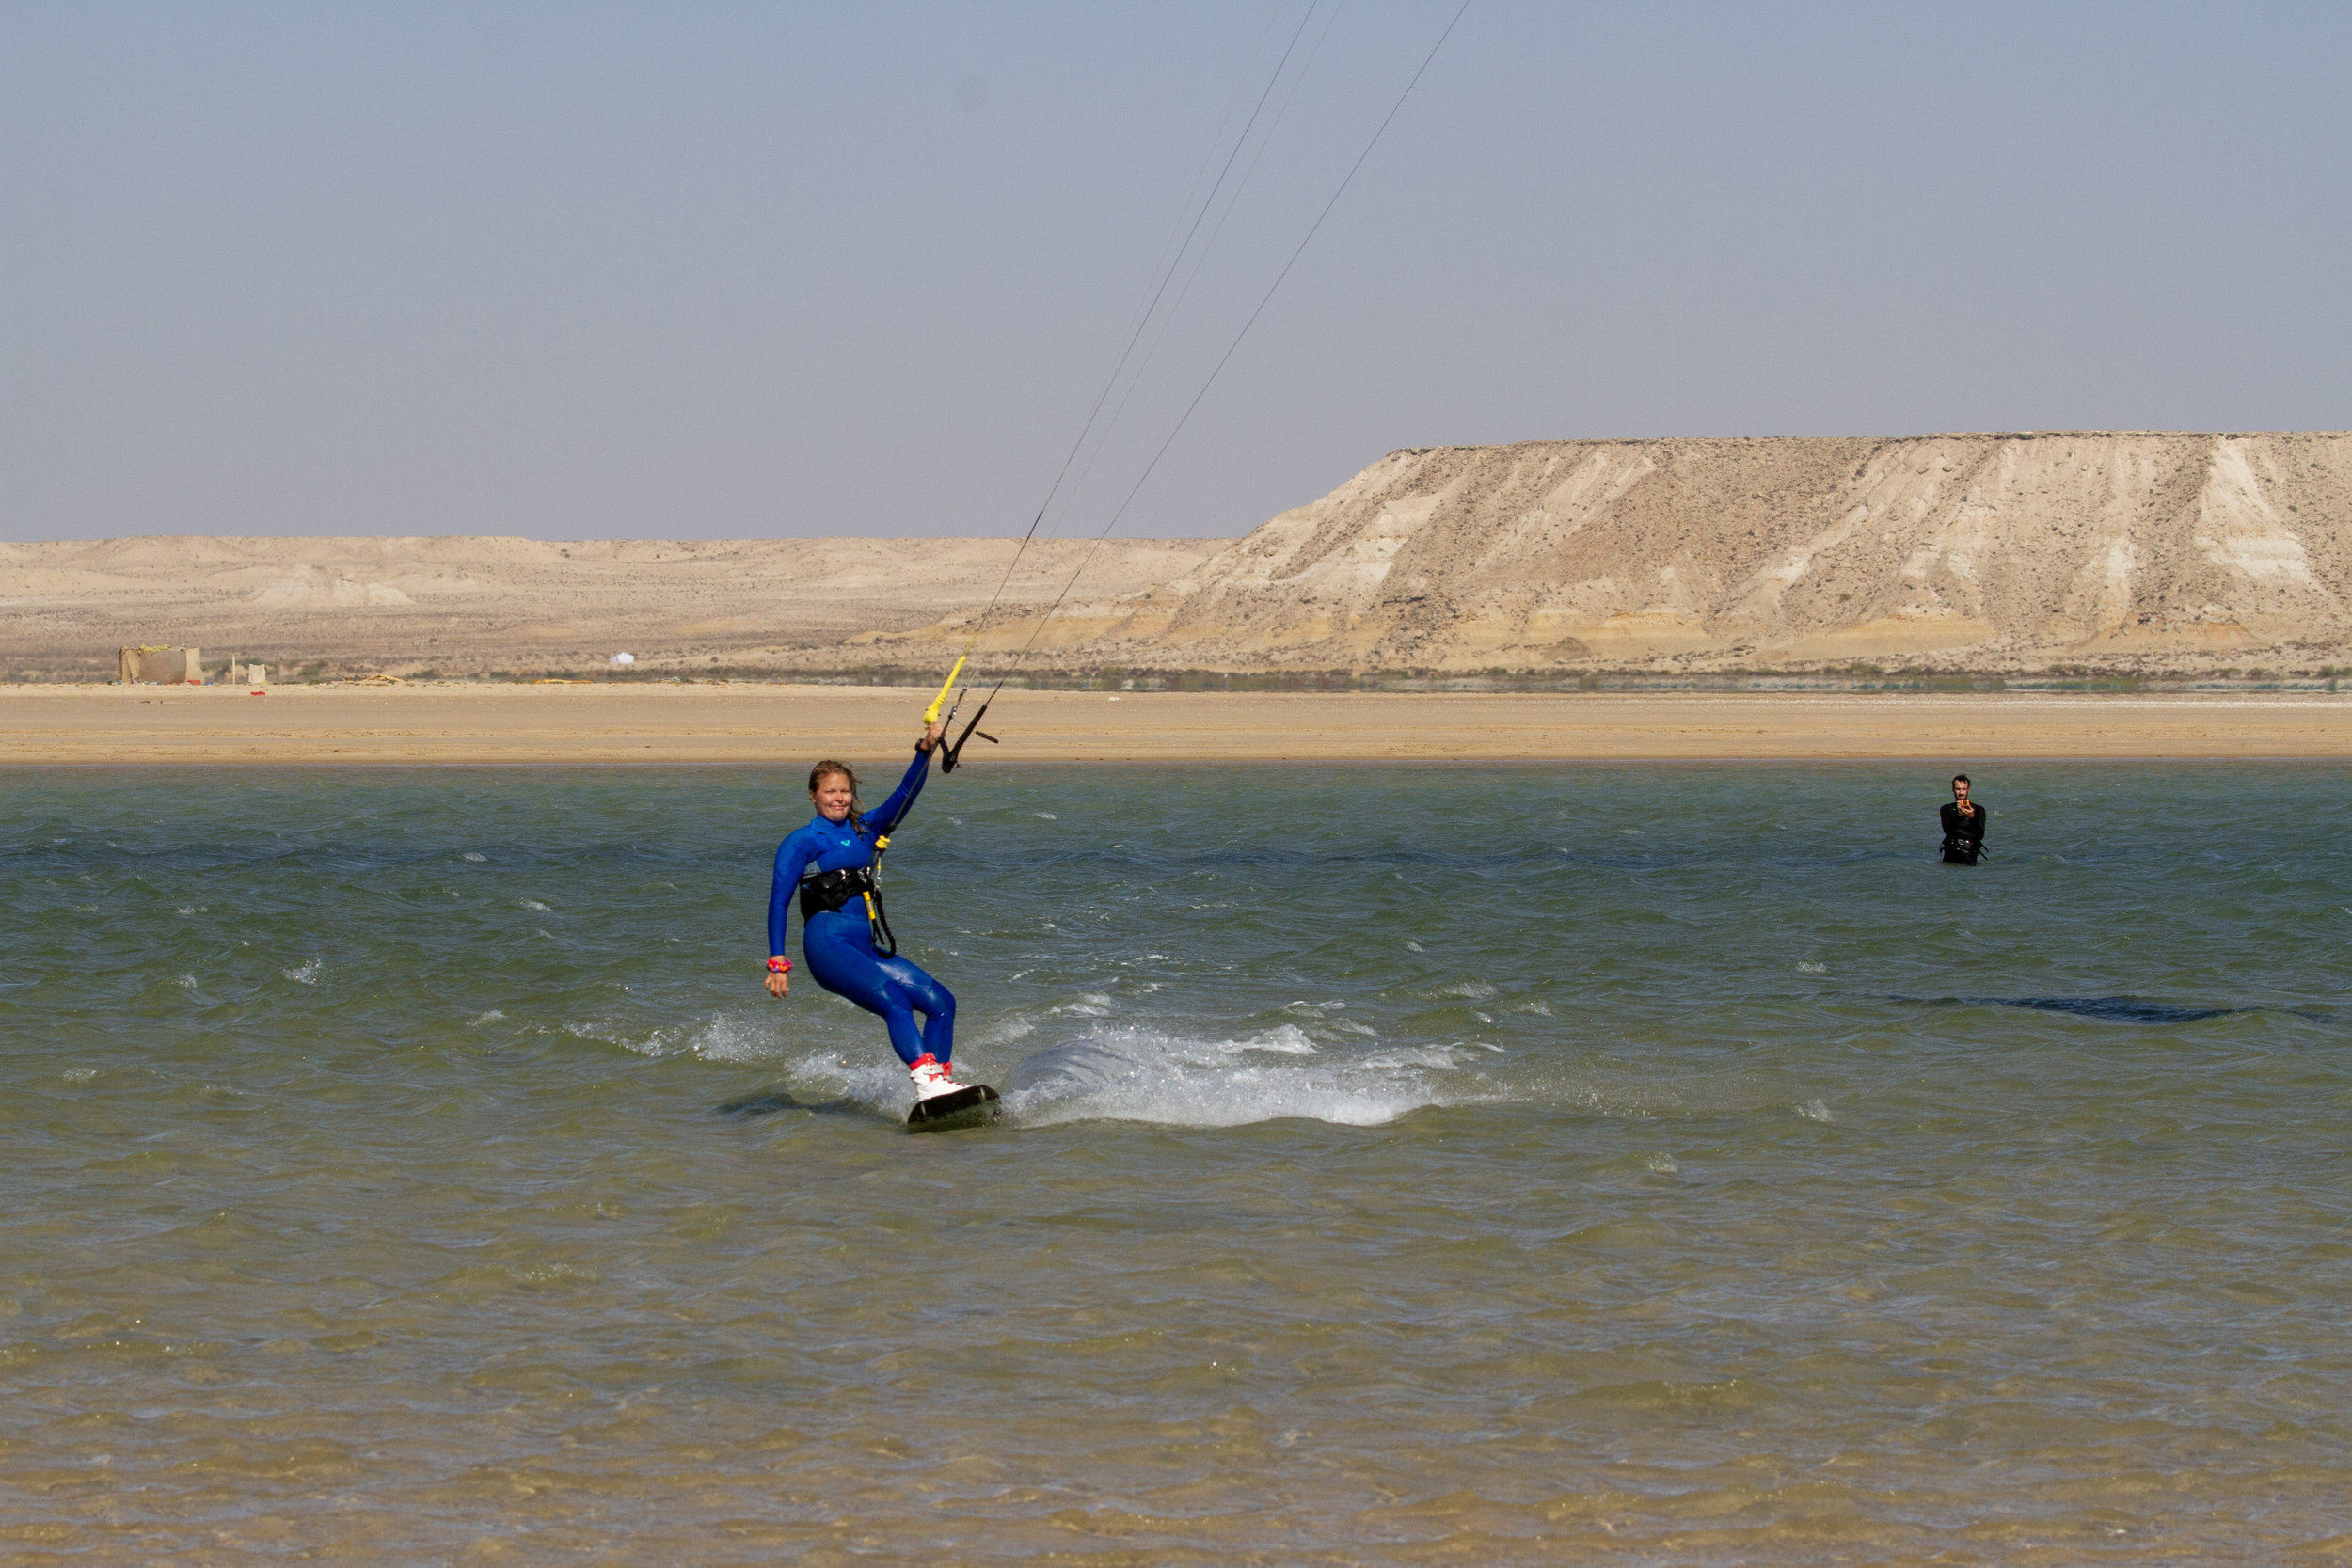 Dakhla kitesurf trip 2019 : Kite Control Portugal.jpg